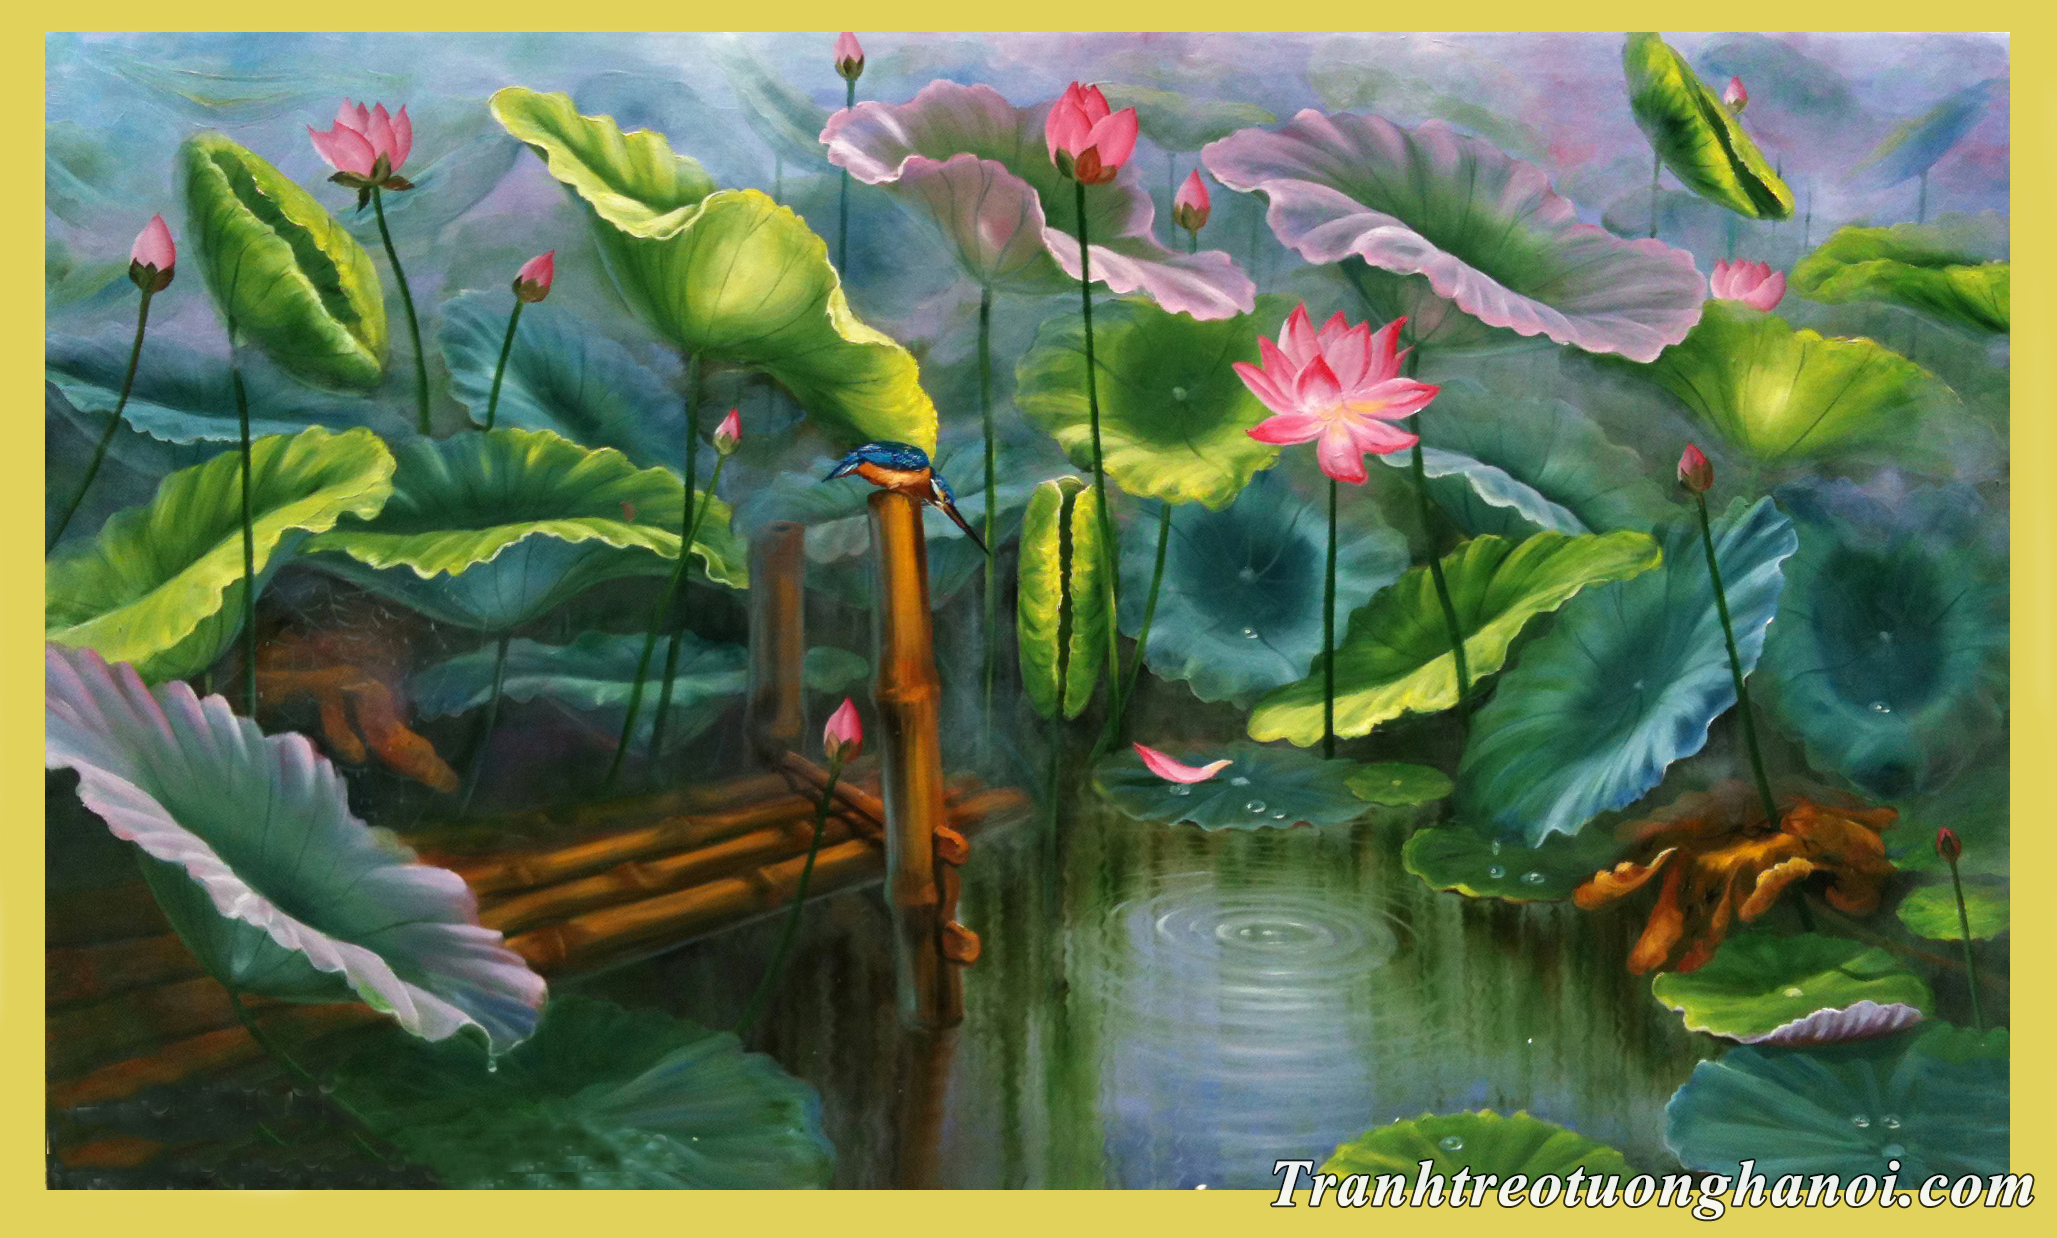 Buc tranh ve hoa sen ao lang voi chu chim boi ca